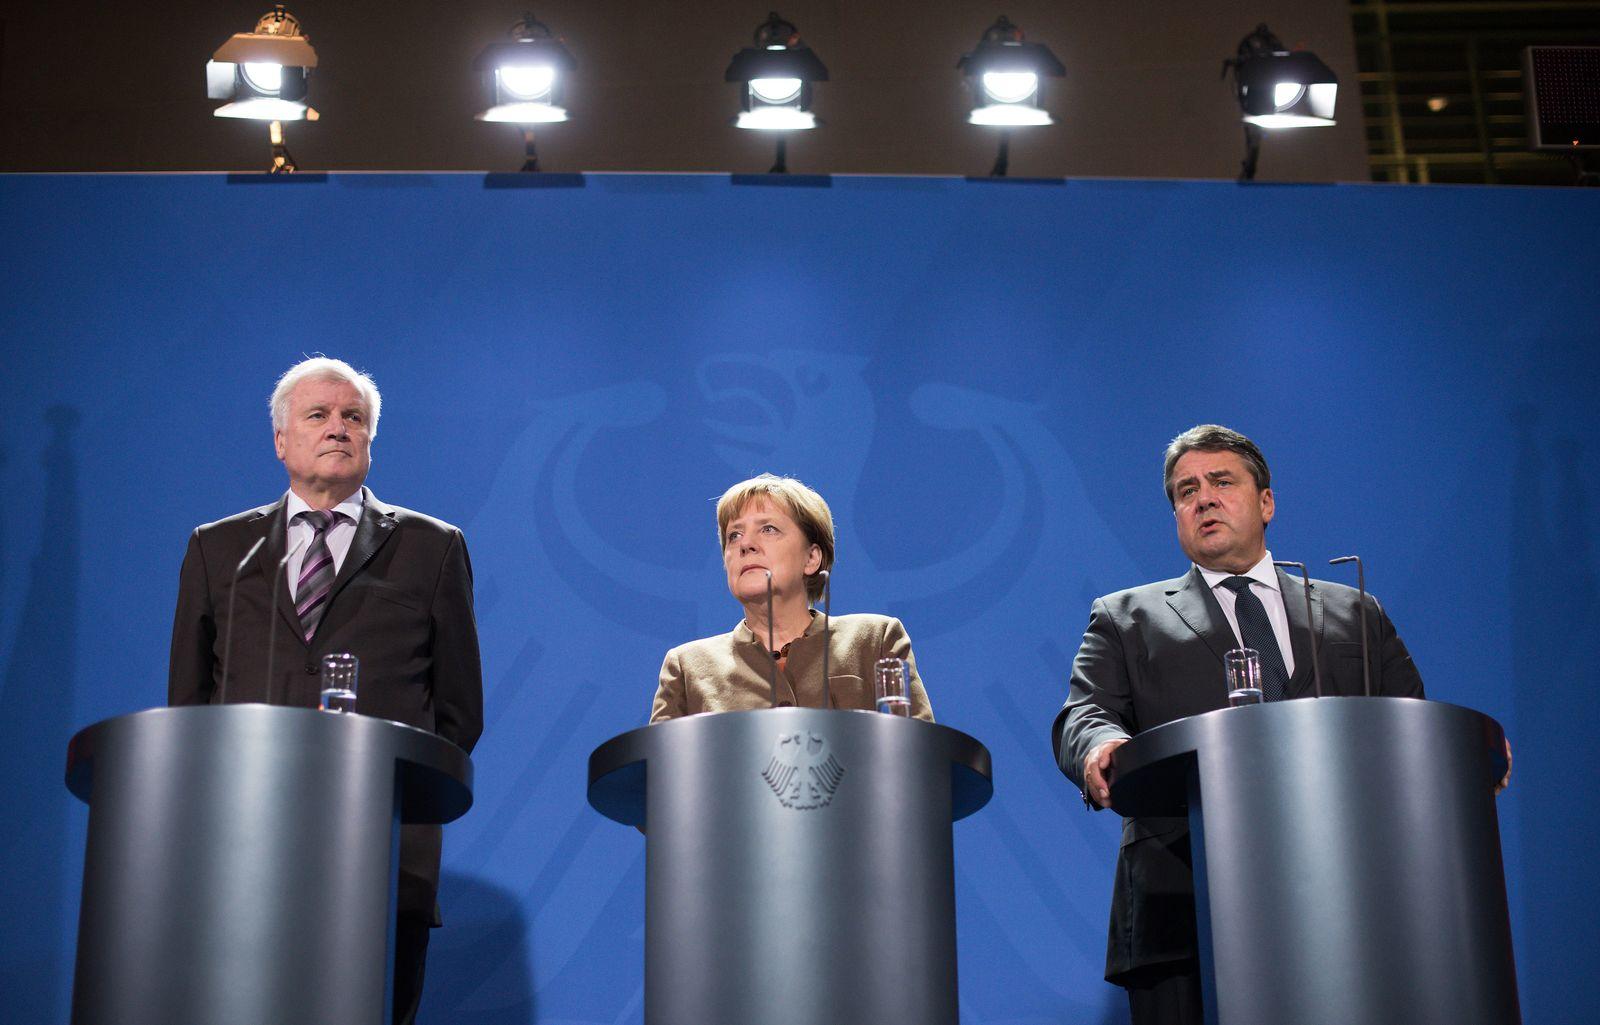 Koalitionsspitzen zur Flüchtlingspolitik